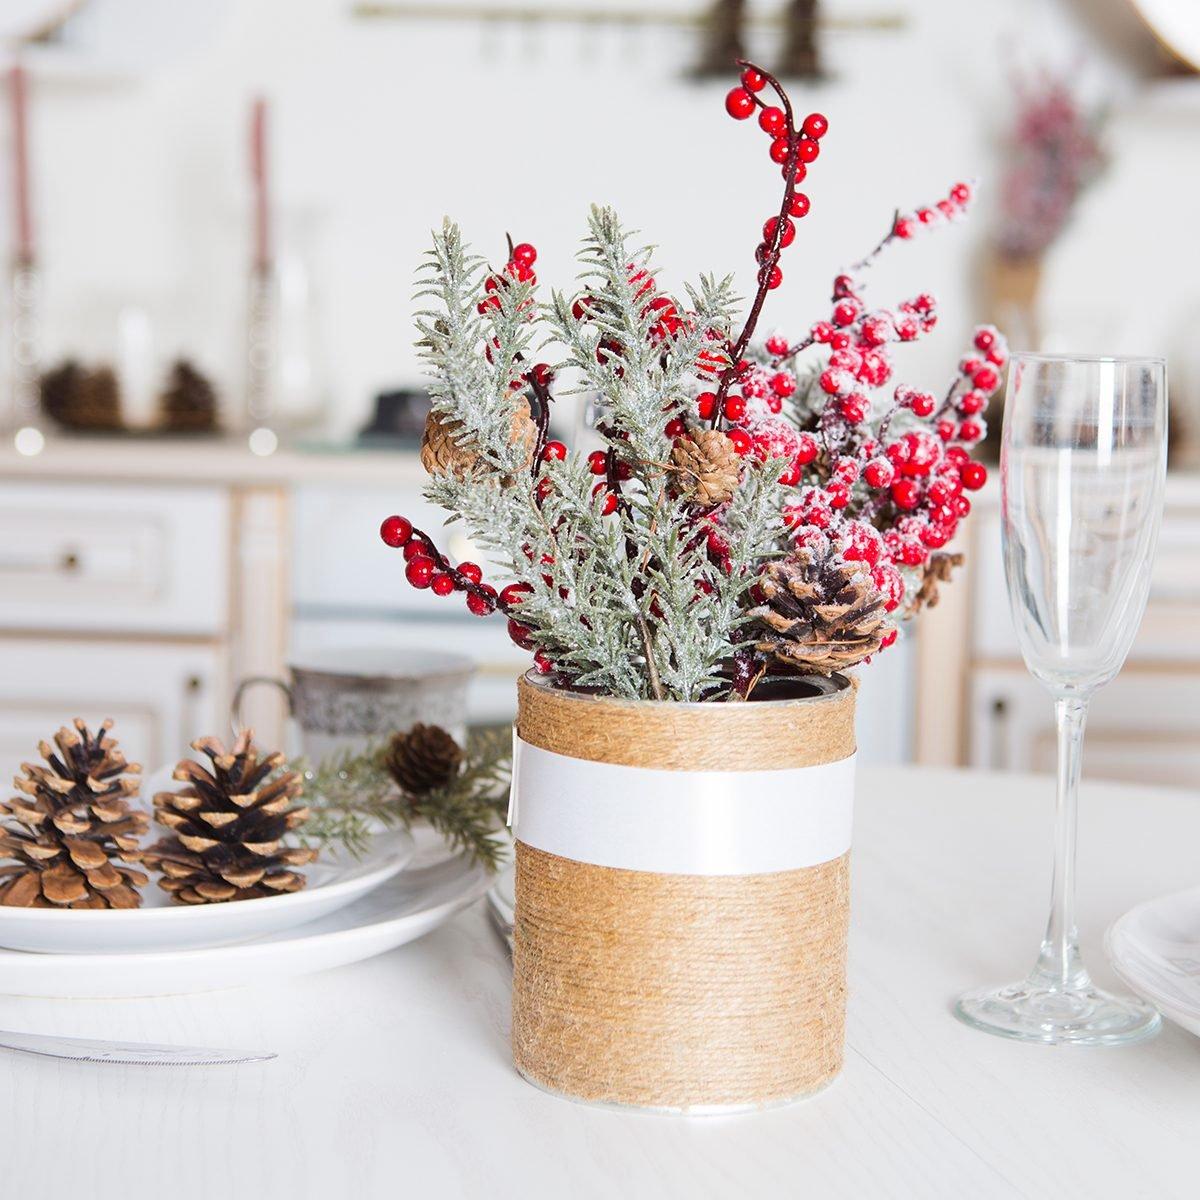 christmas decor kitchen table.